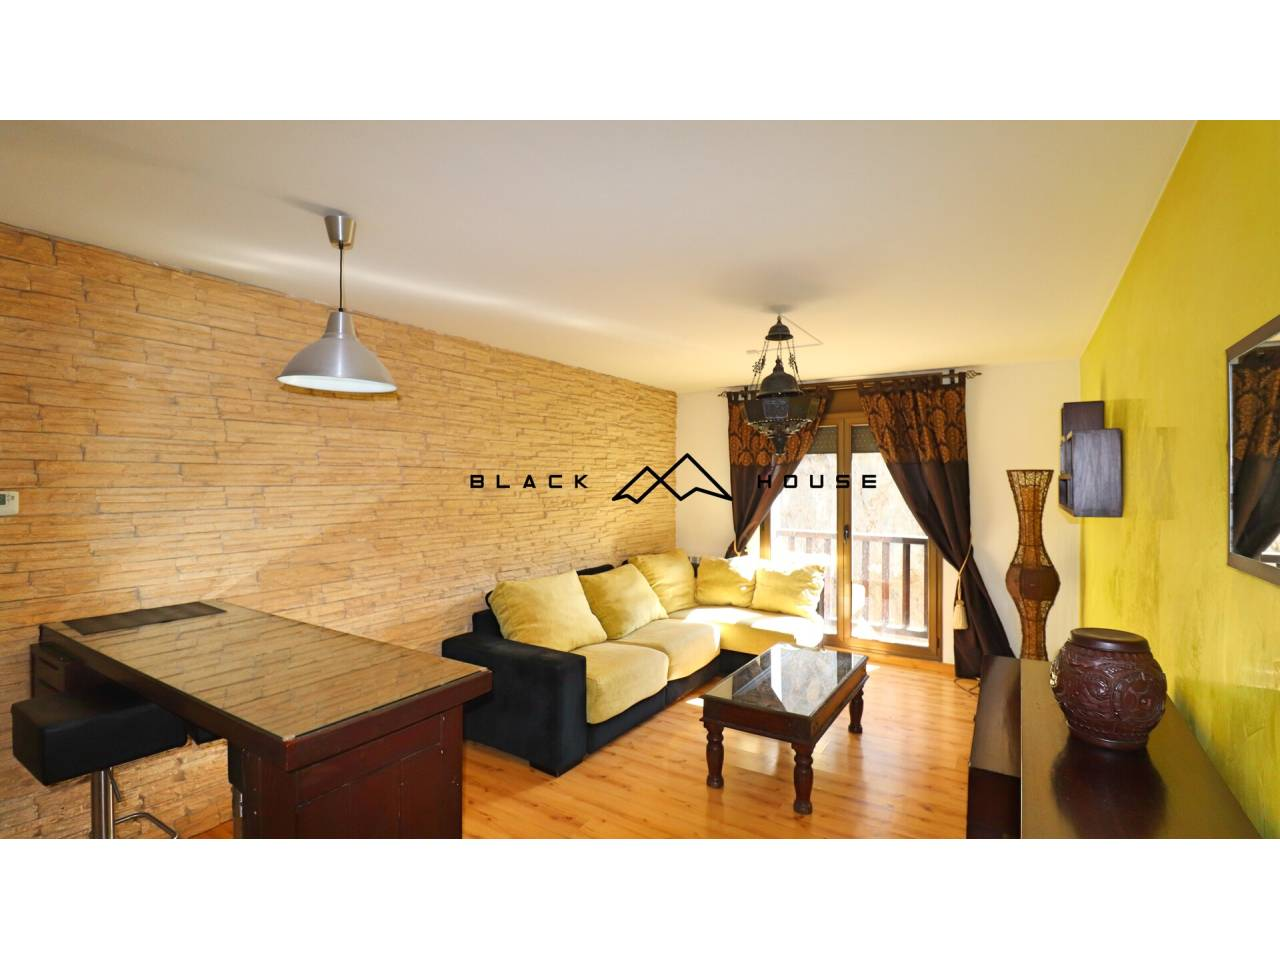 Apartament en venda en El Tarter